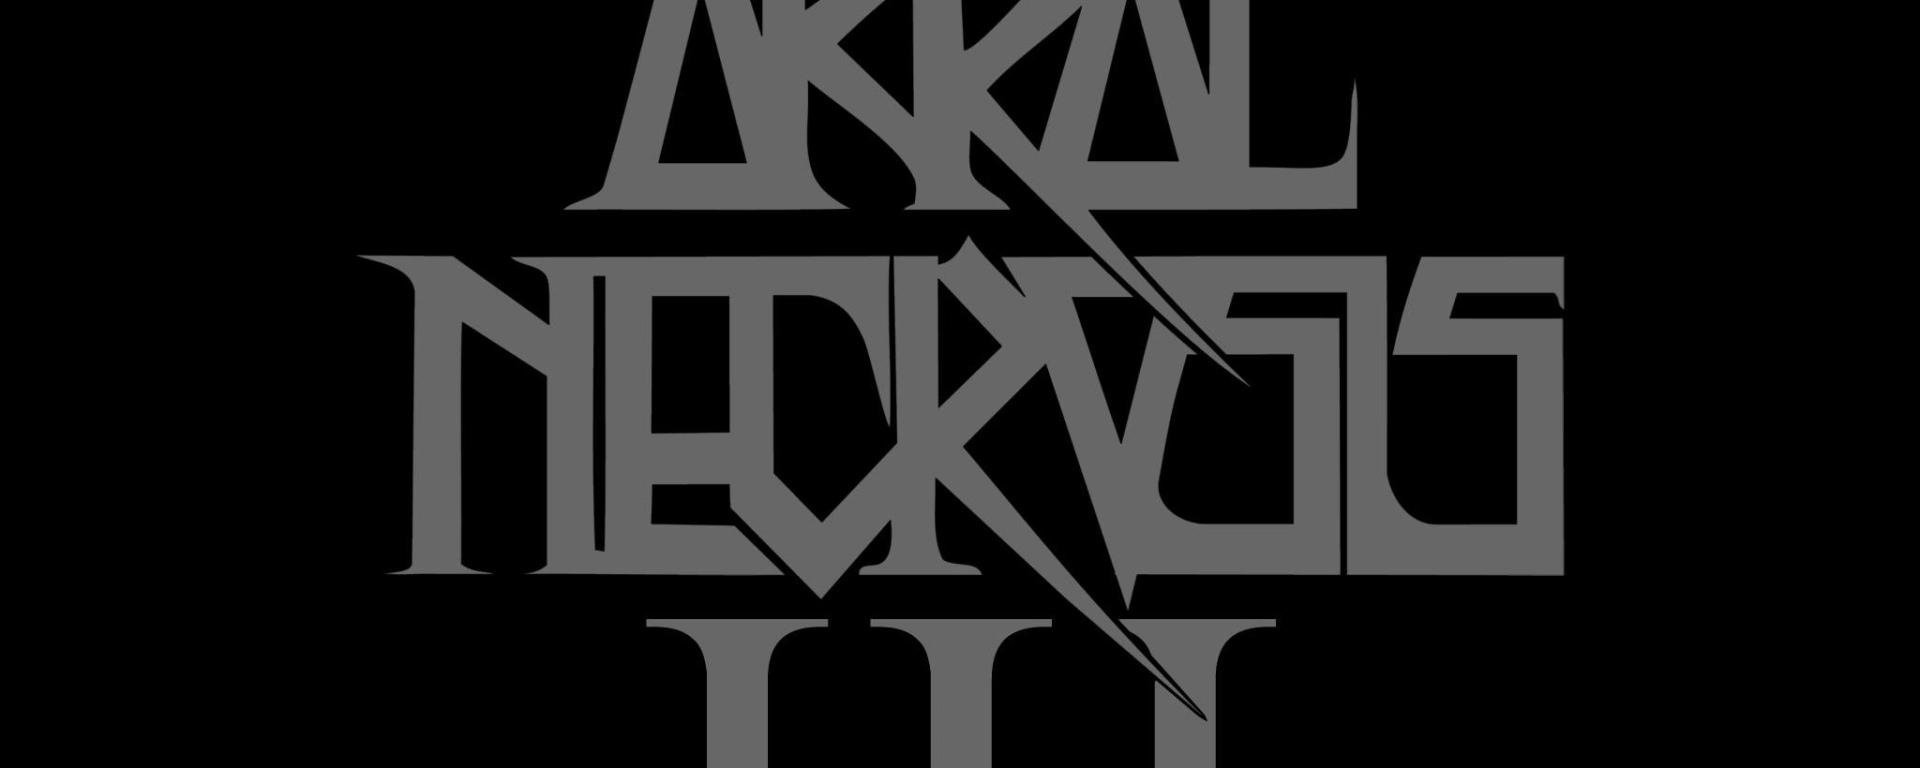 Akral Necrosis ofera detalii noi despre viitorul album si o noua colaborare - Contemporary-Establishment